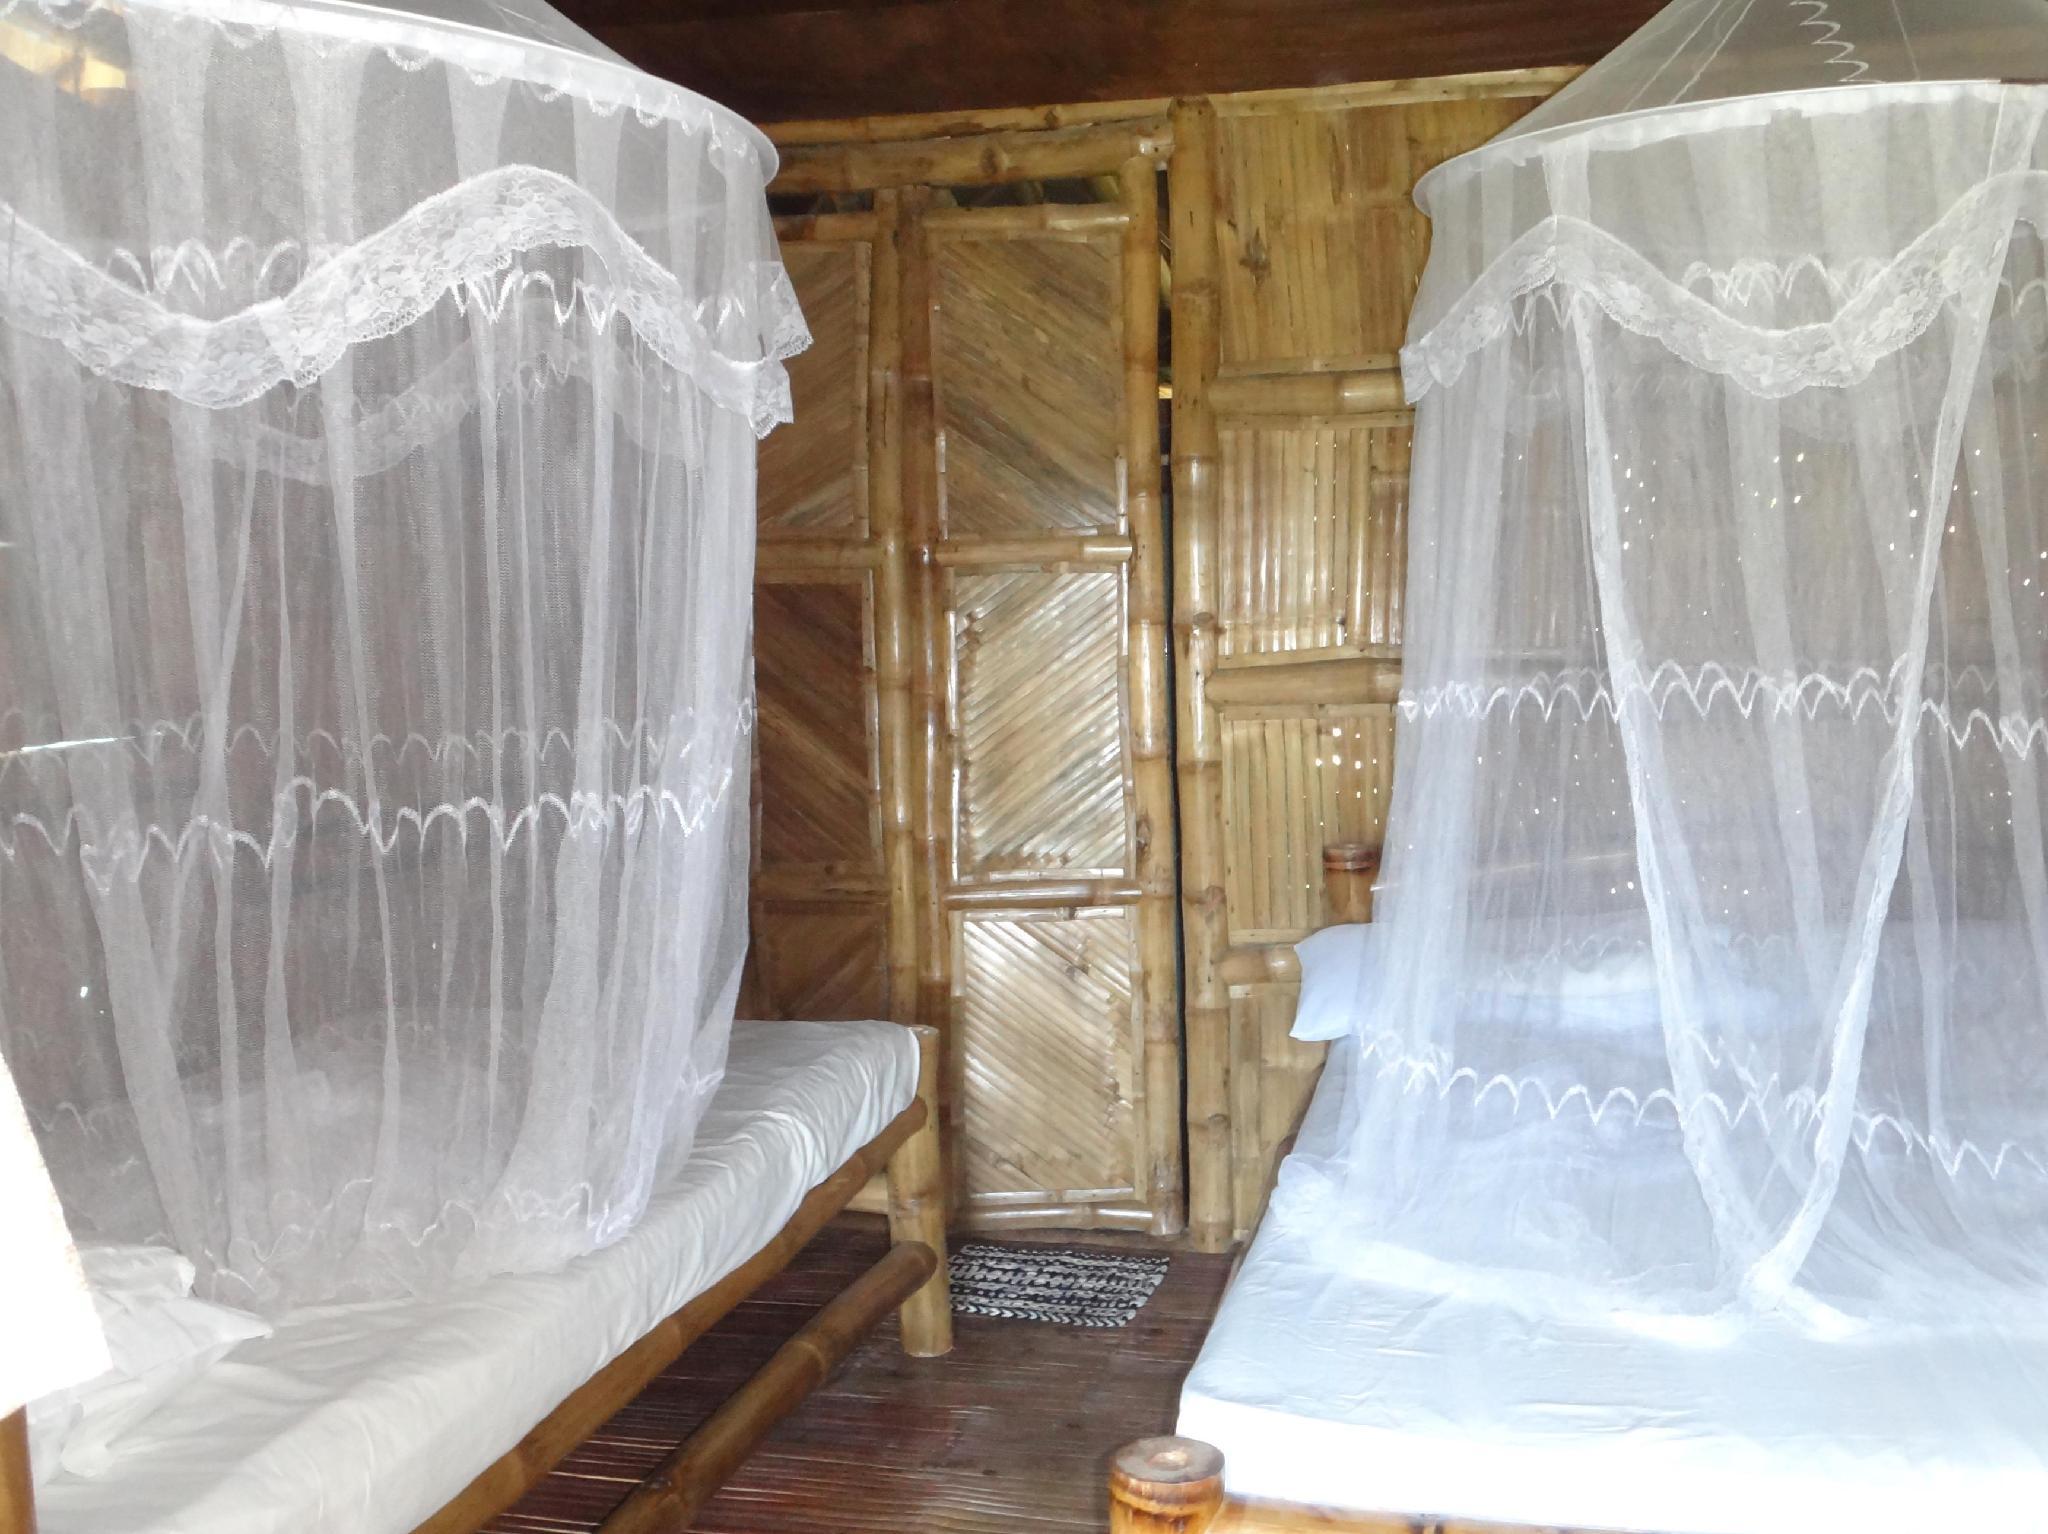 Myrnas Bamboo Cottages